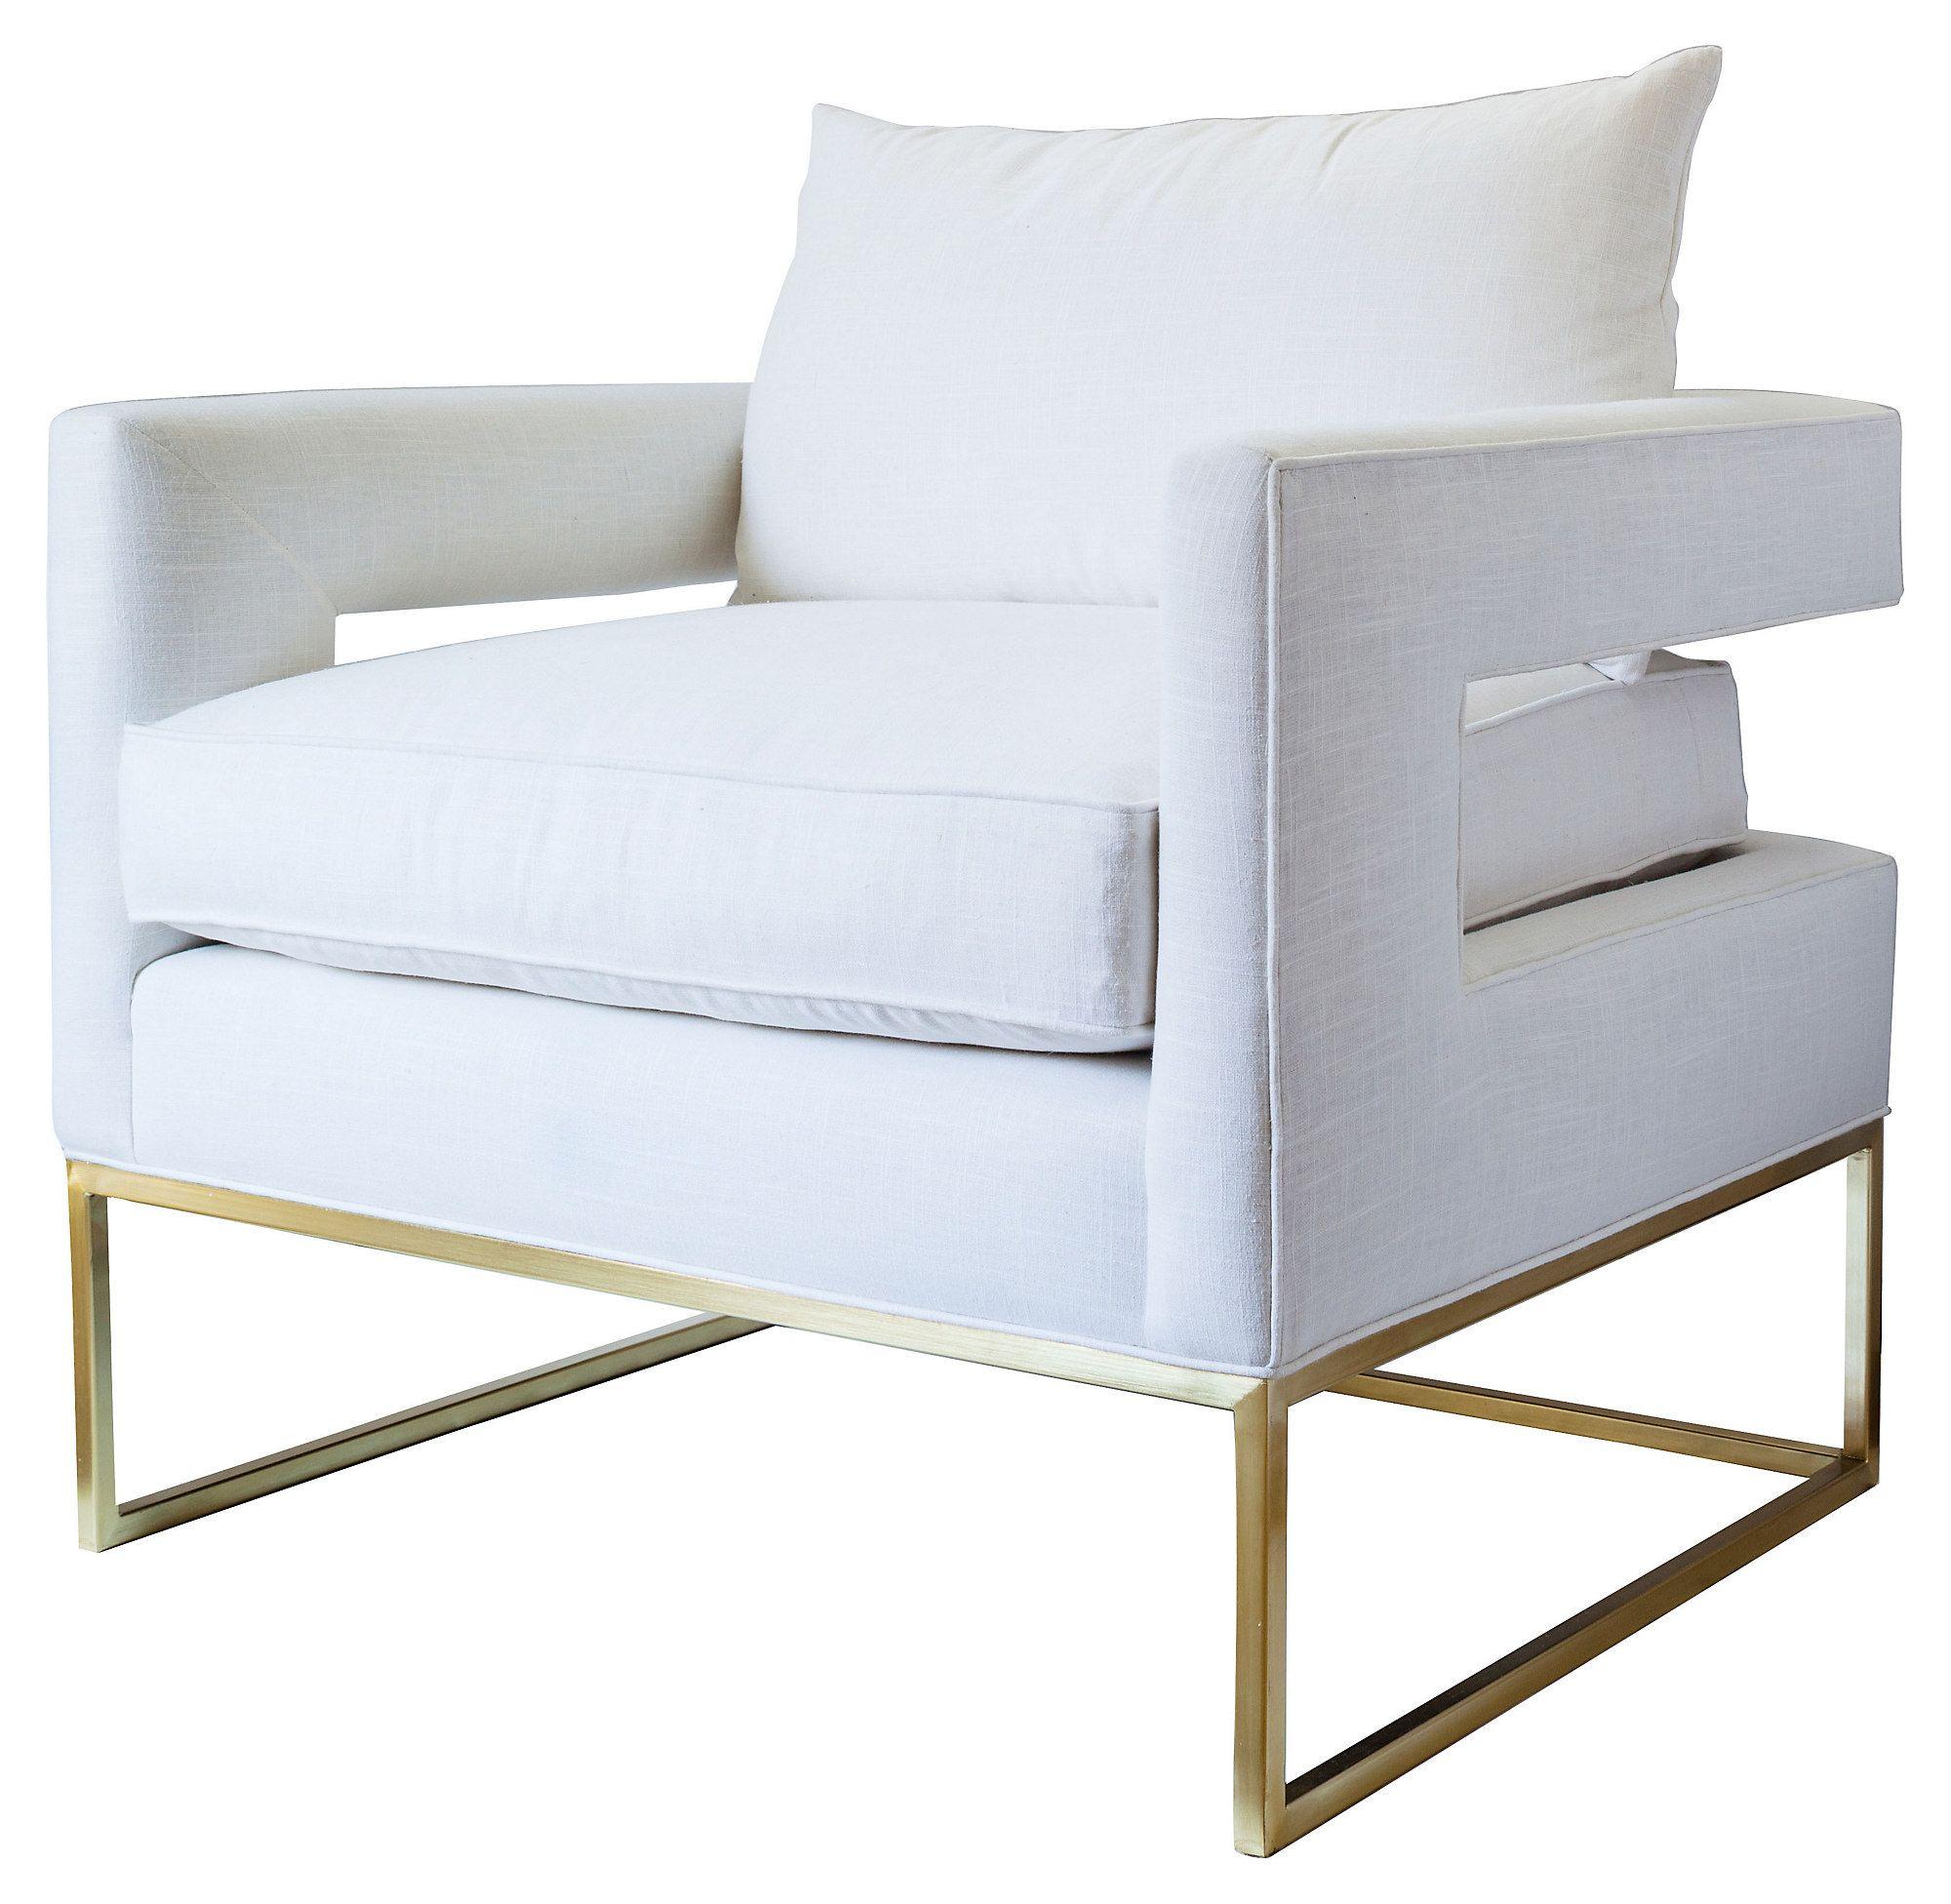 Bevin accent chair white linen one kings lane linen